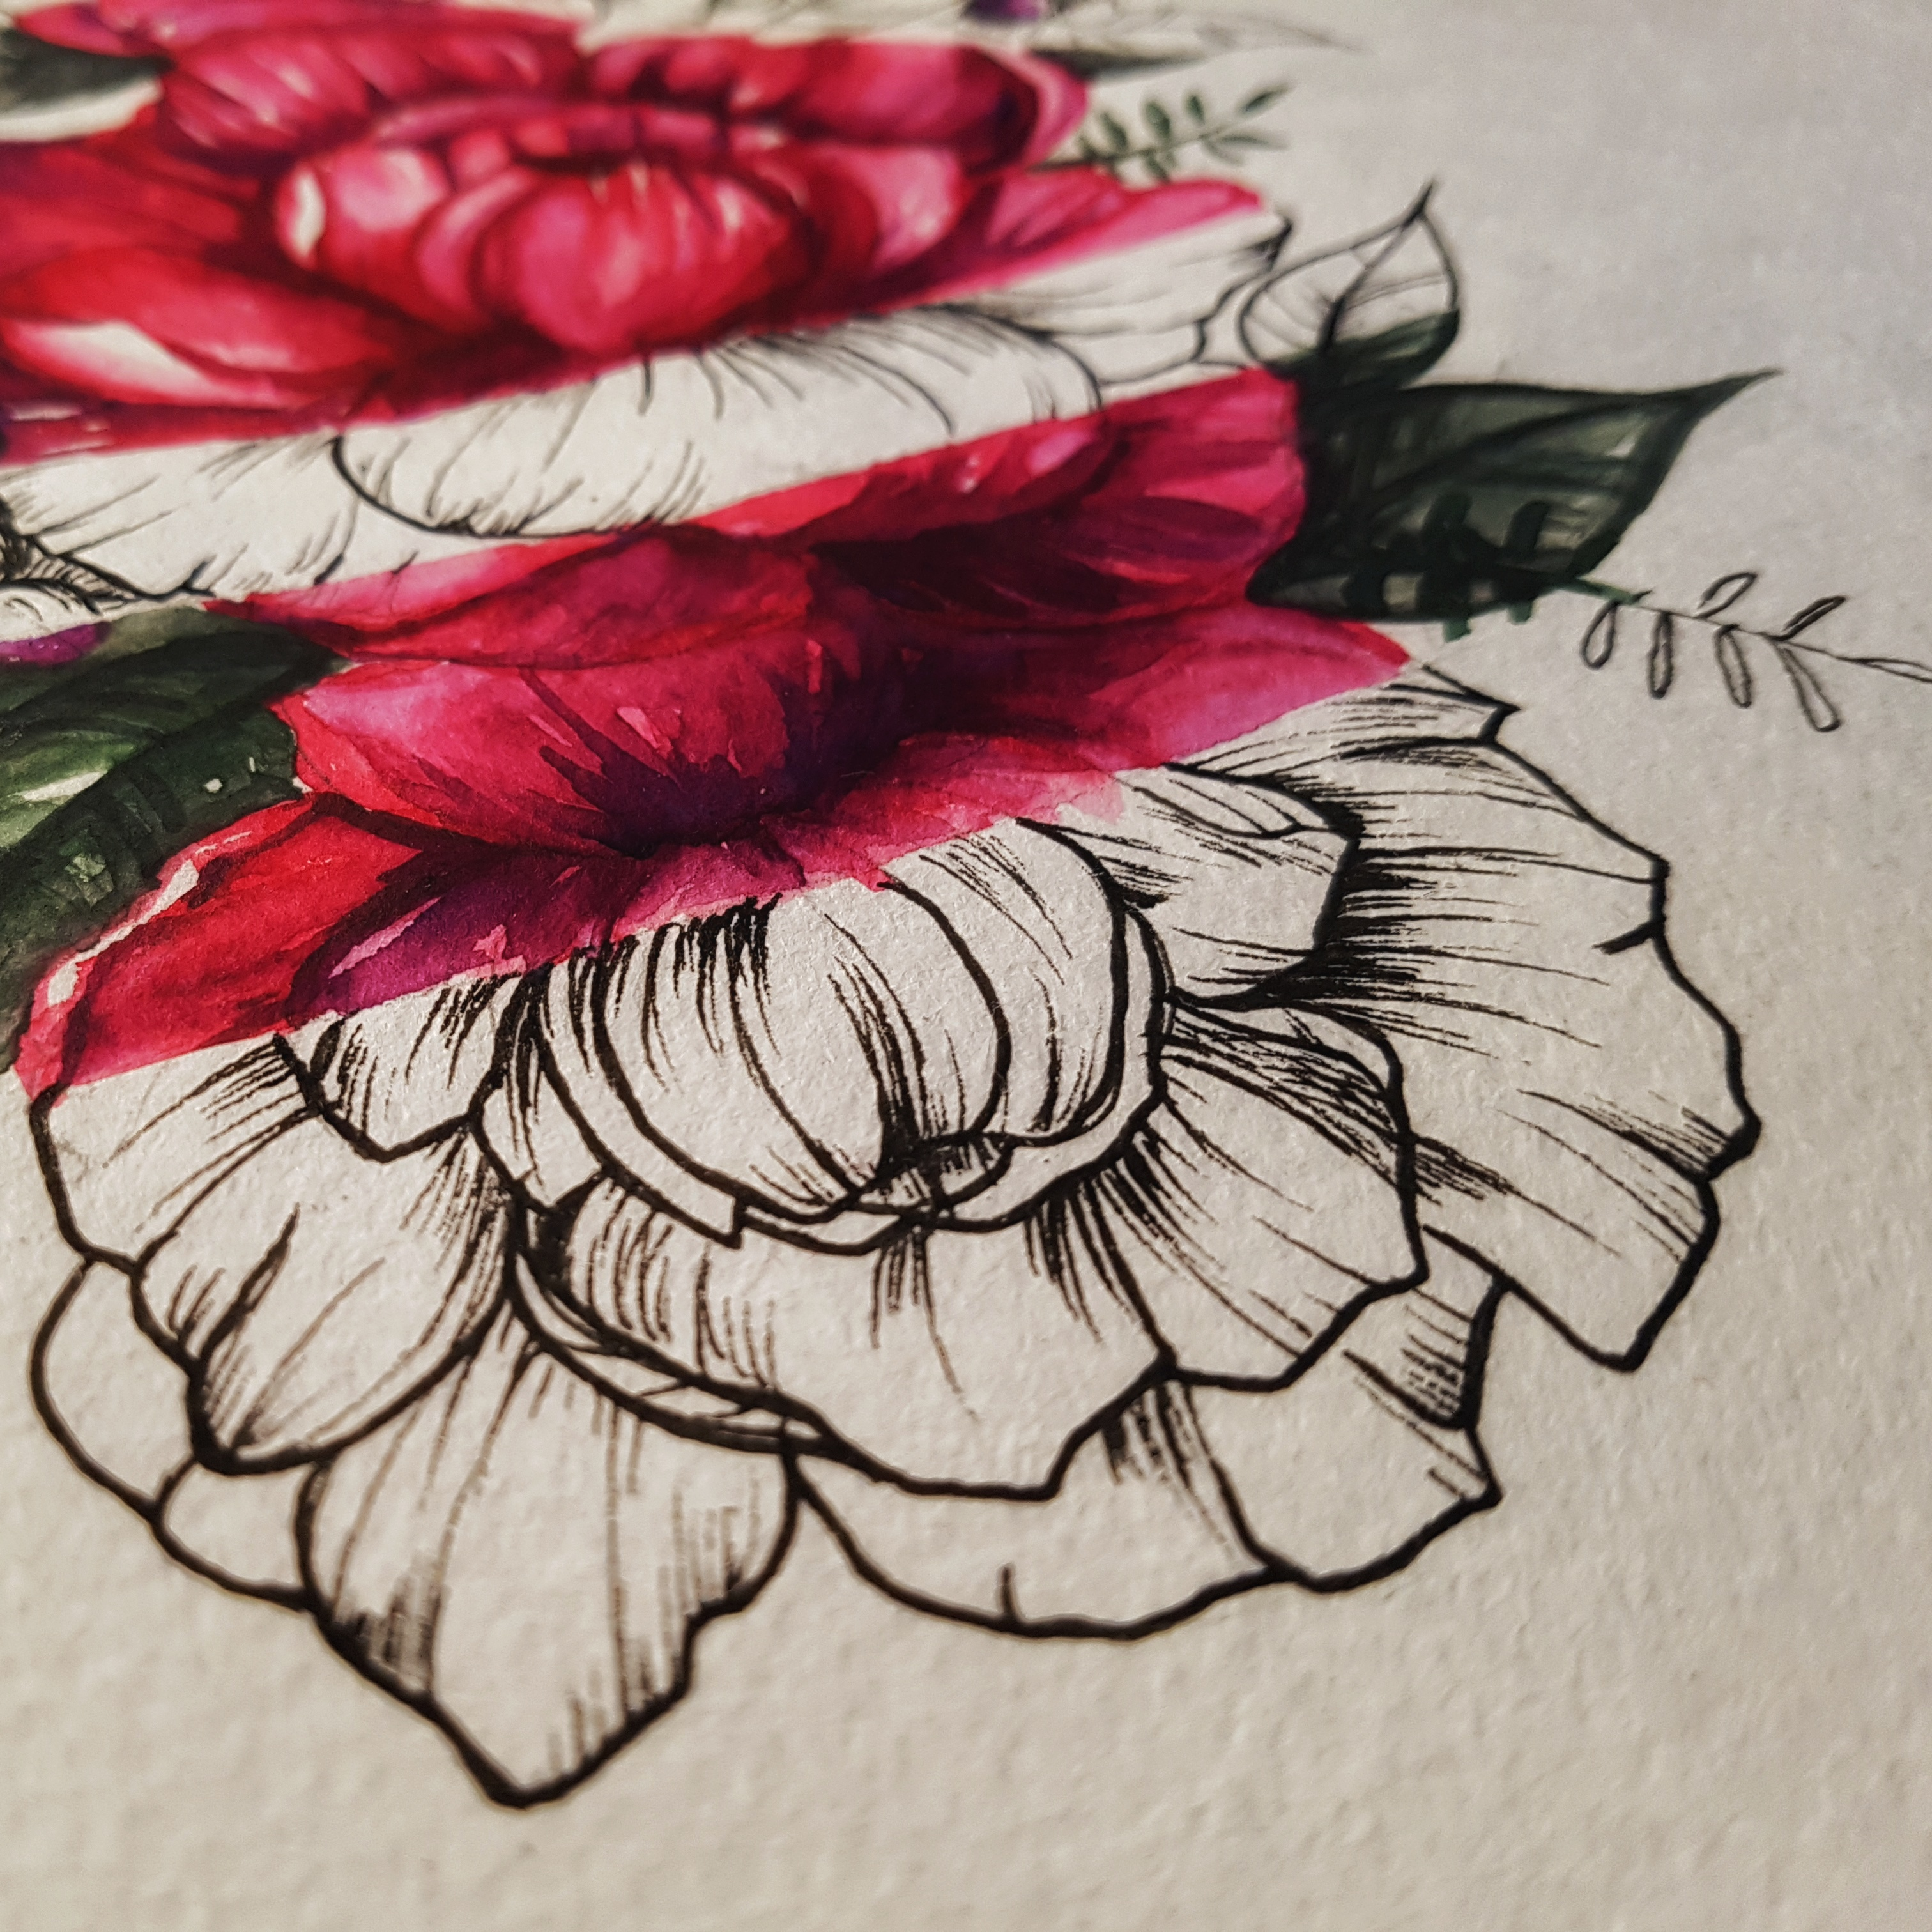 peony-tattoo-half-colored-2